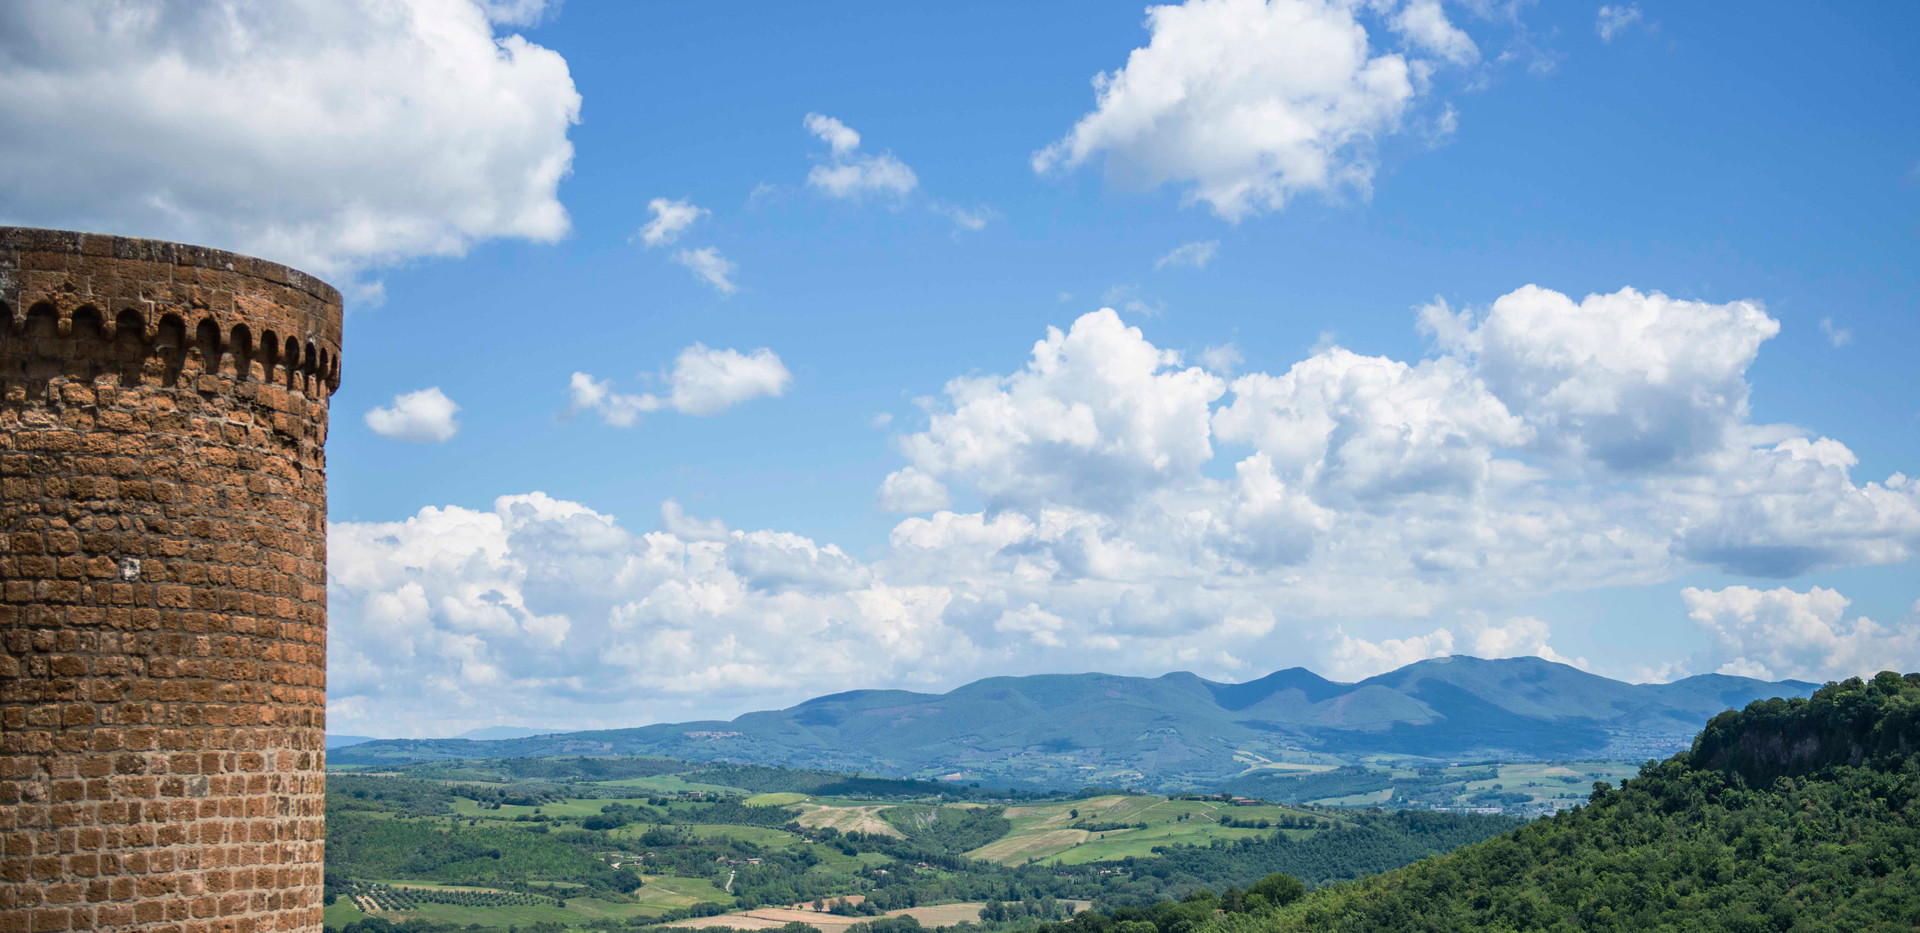 Umbrian panorama from Orvieto